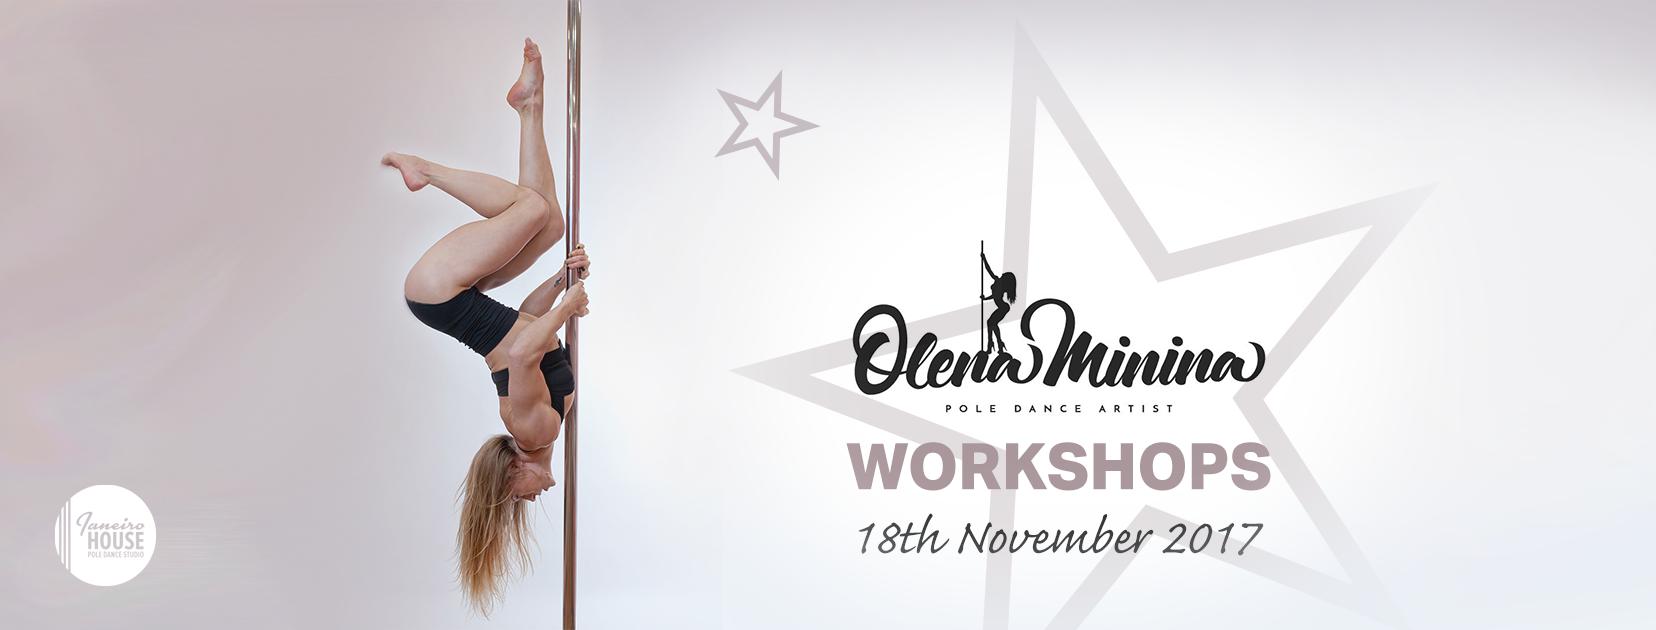 Workshops with Olena Minina